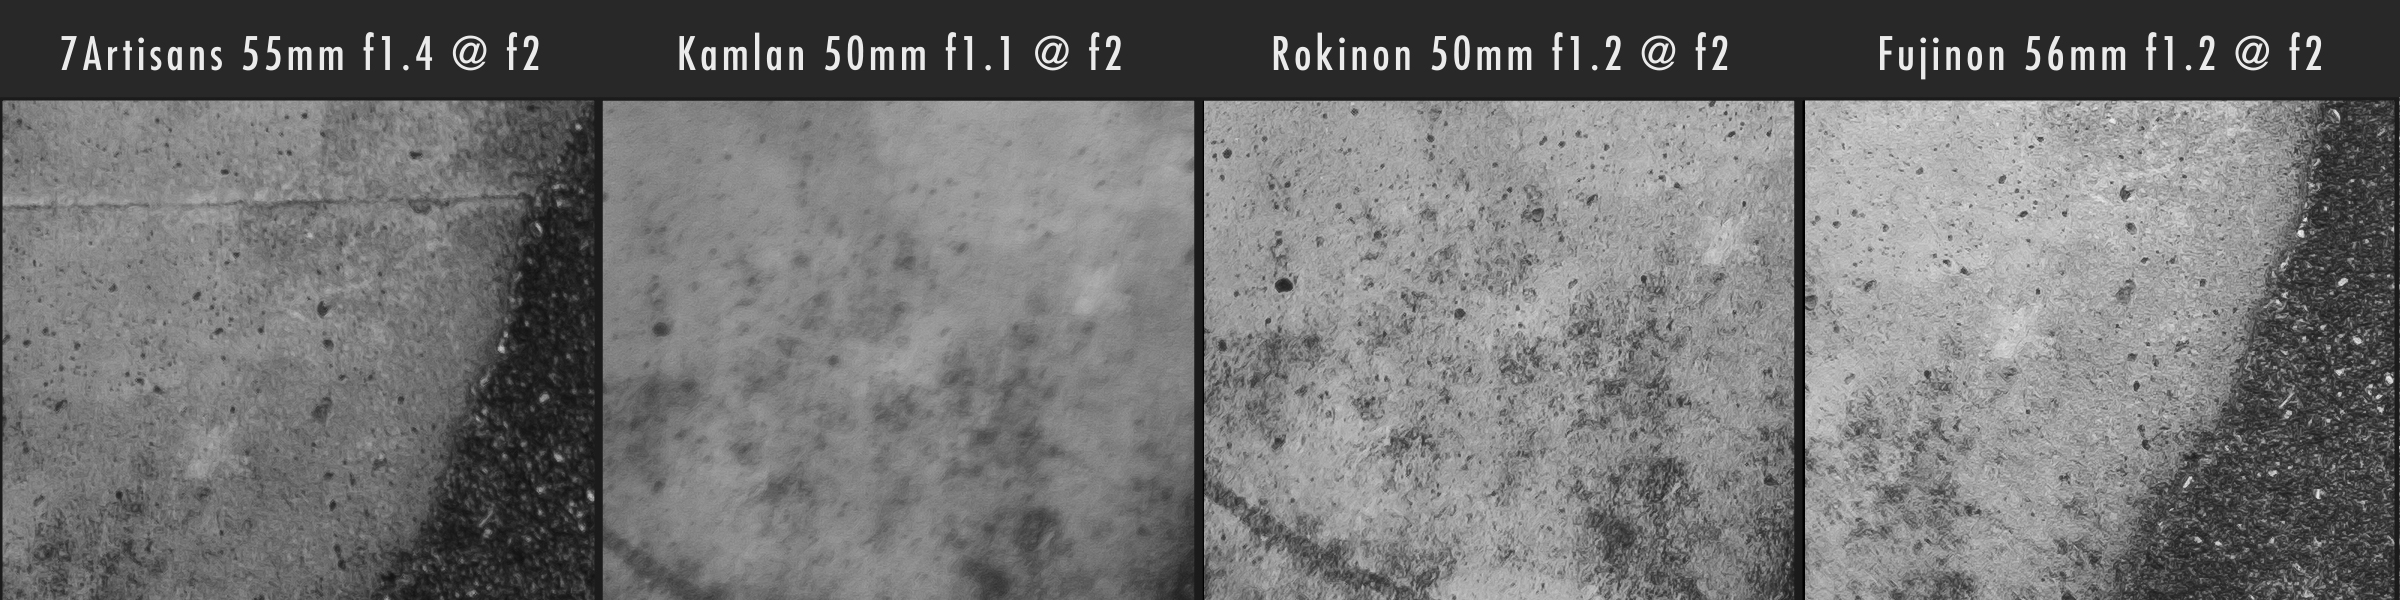 Kamlan 50mm f1.1 vs 7Artisans 55mm f1.4 vs Rokinon 50mm f1.2 Corner Sharpness @ f2